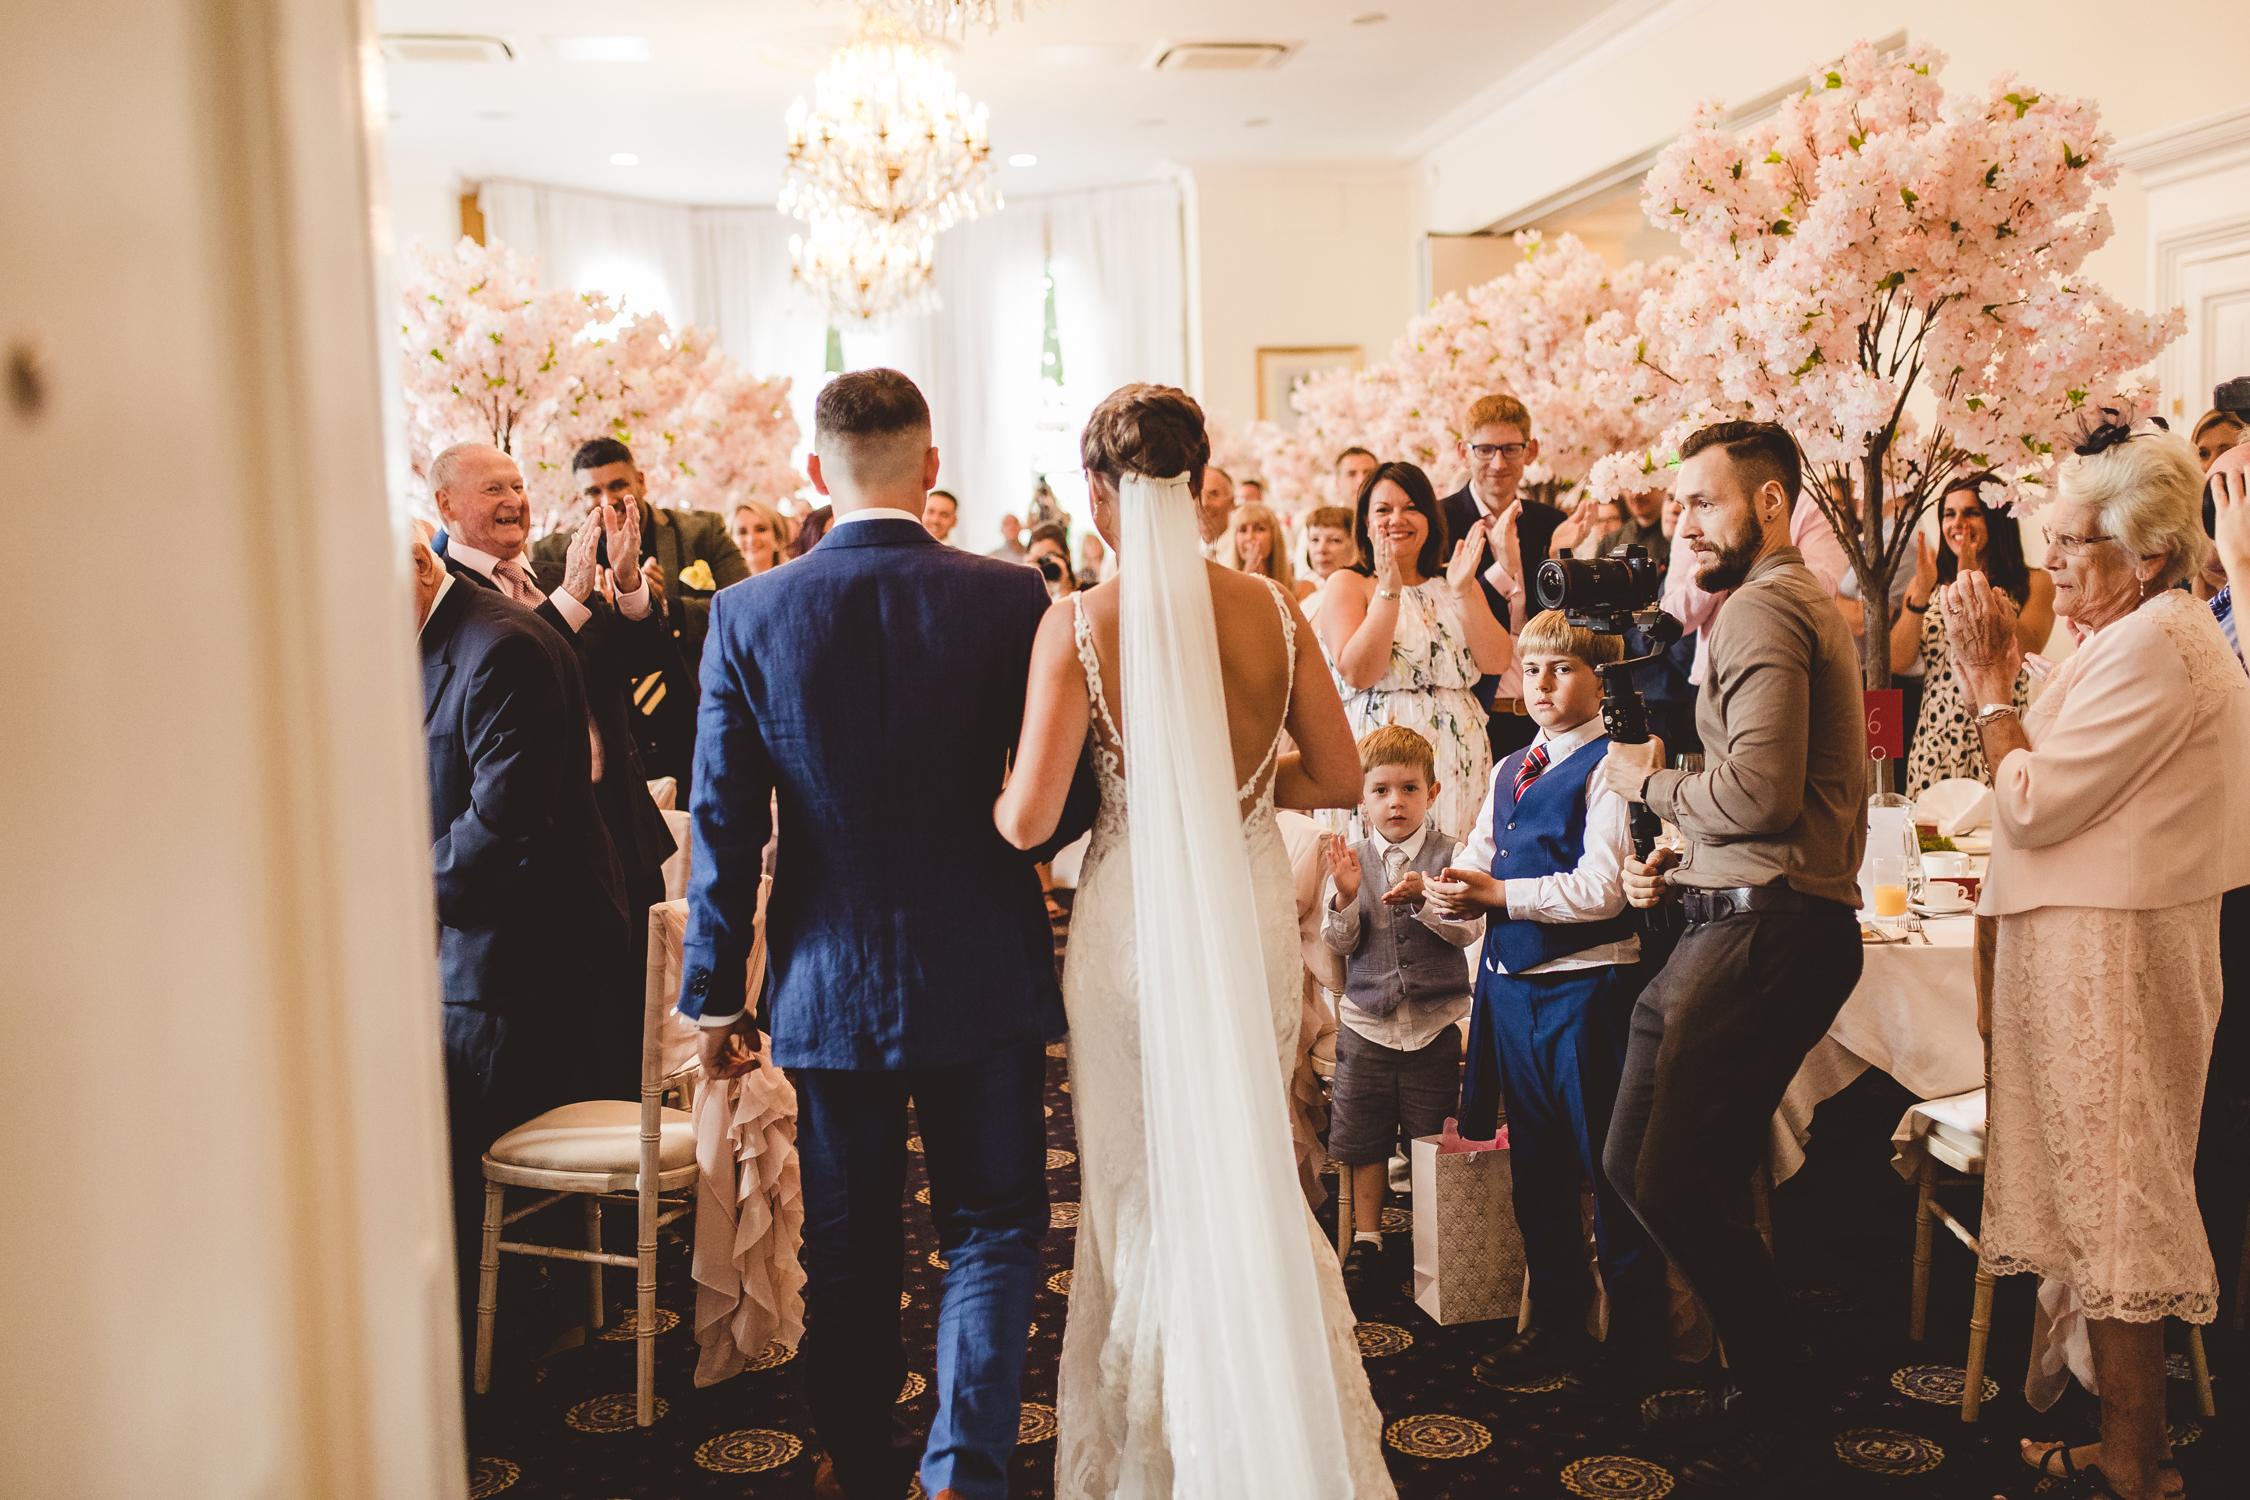 Tunbridge Wells Wedding Spa Hotel Vilcinskaite Photo 80.jpg